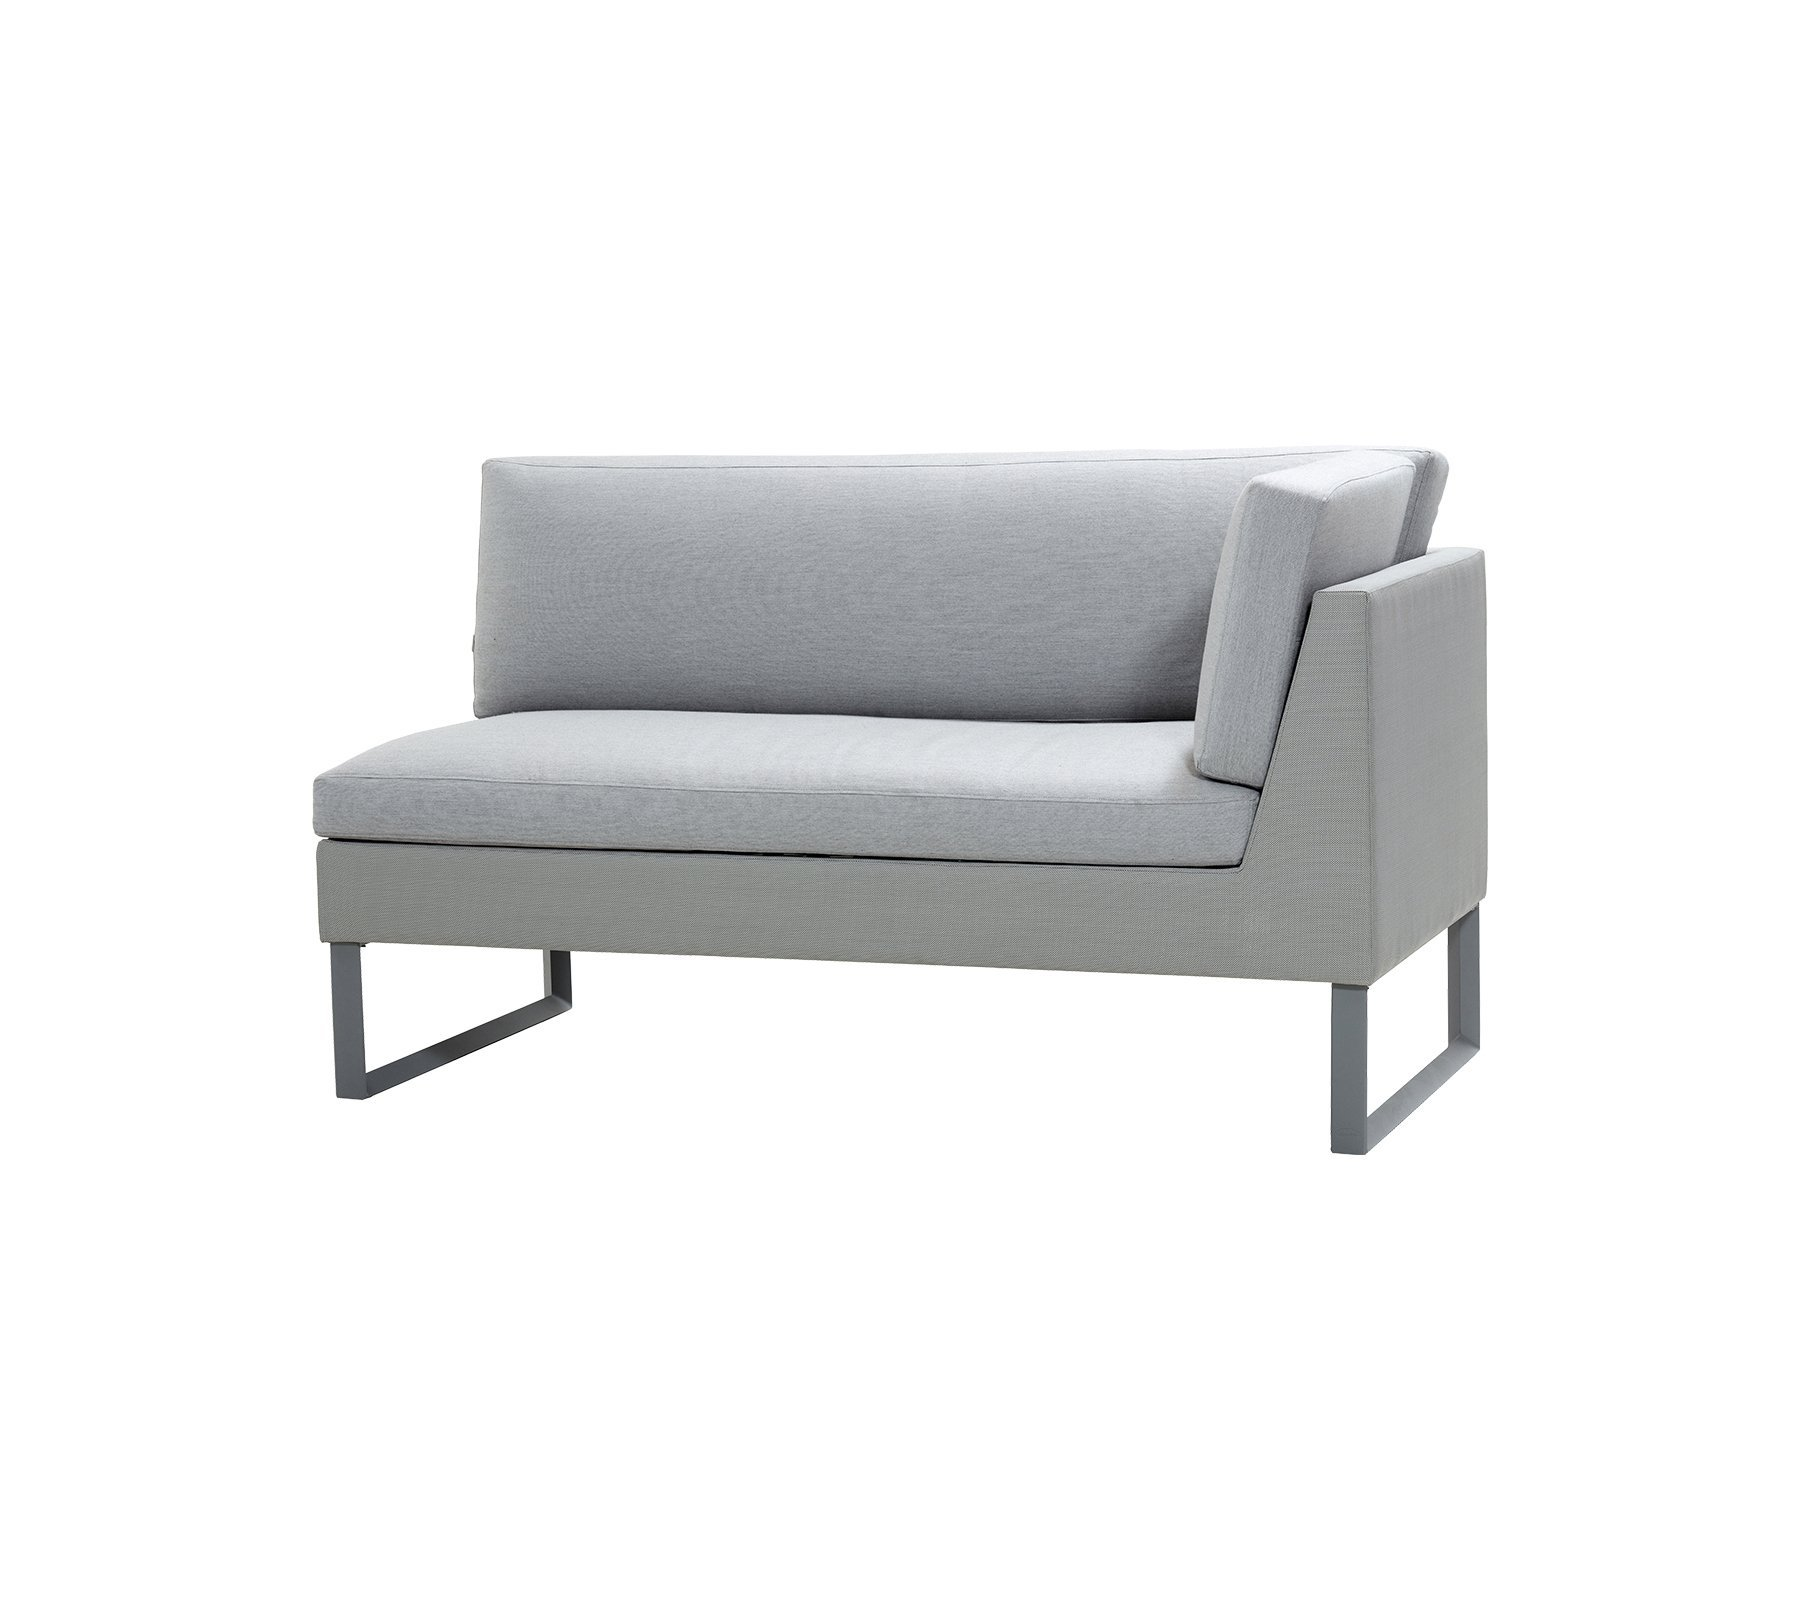 Flex 2 Seat Left Module Sofa modular from Cane-line